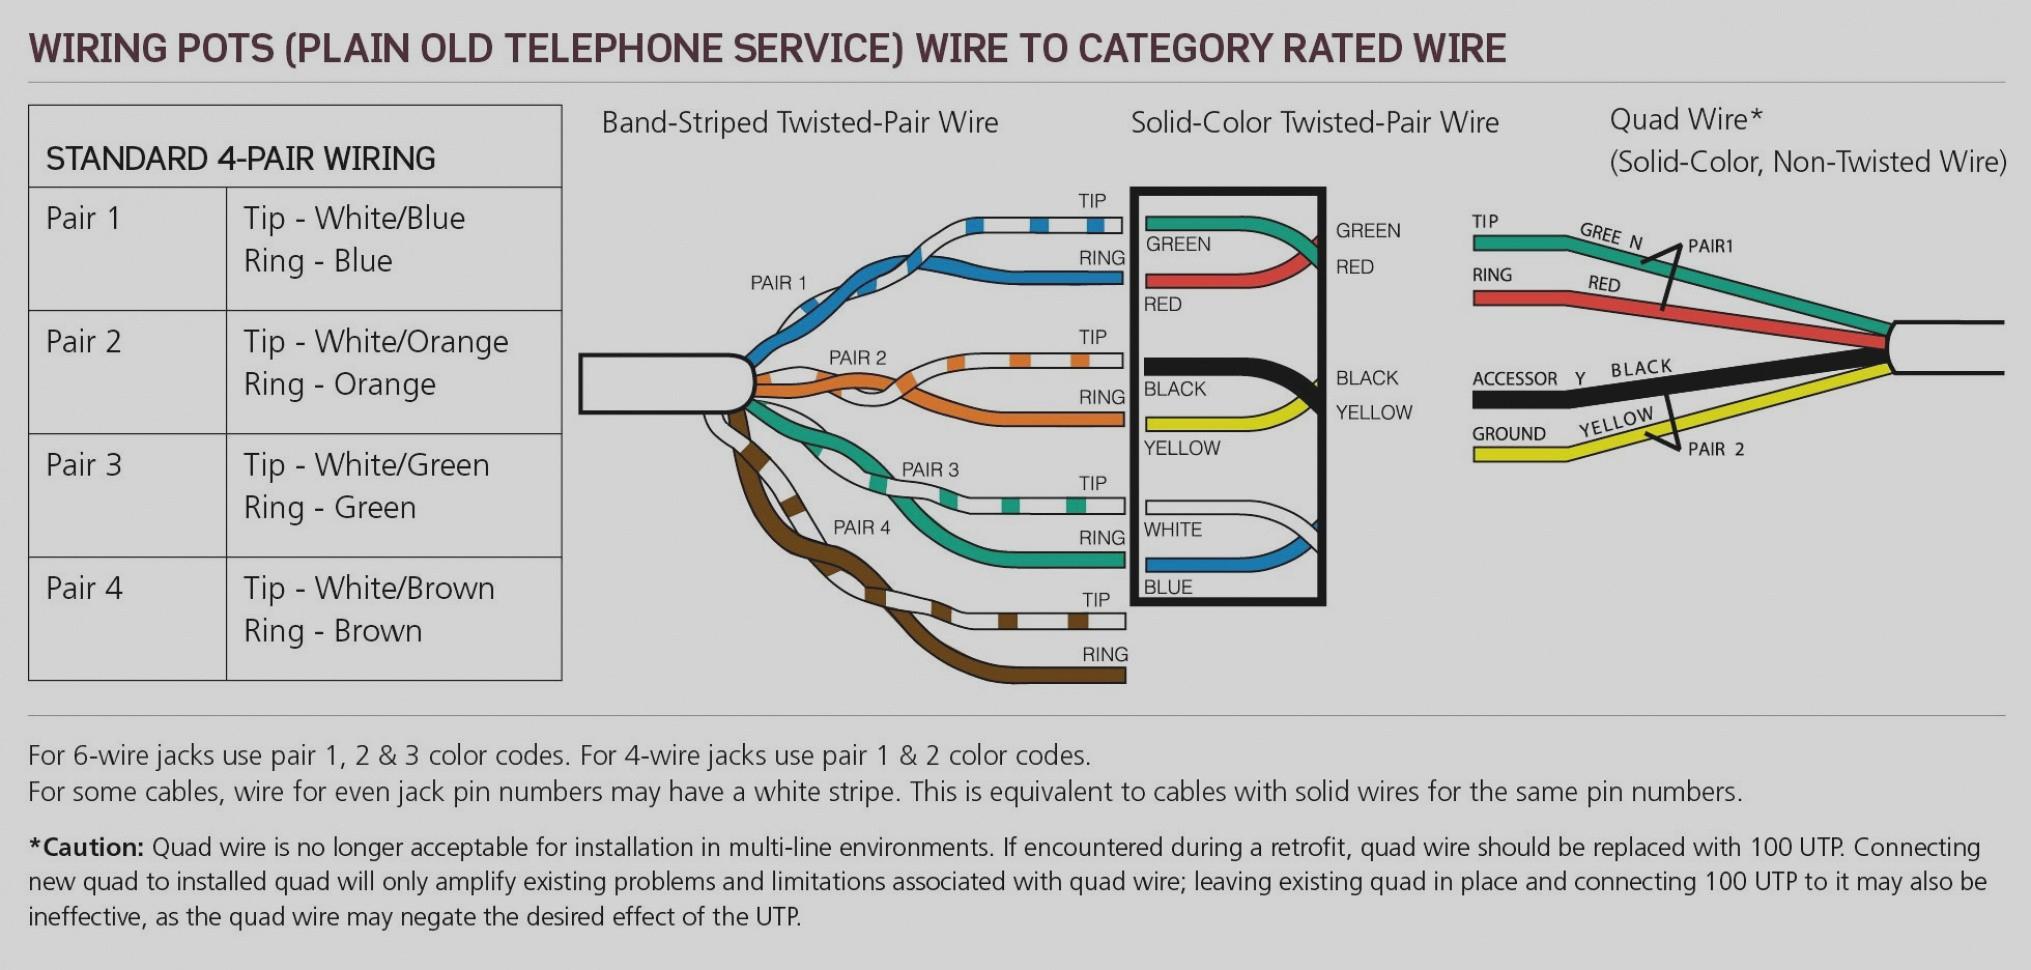 Cat 3 Wiring Color Code - Wiring Diagram Blog - Cat 3 Wiring Diagram